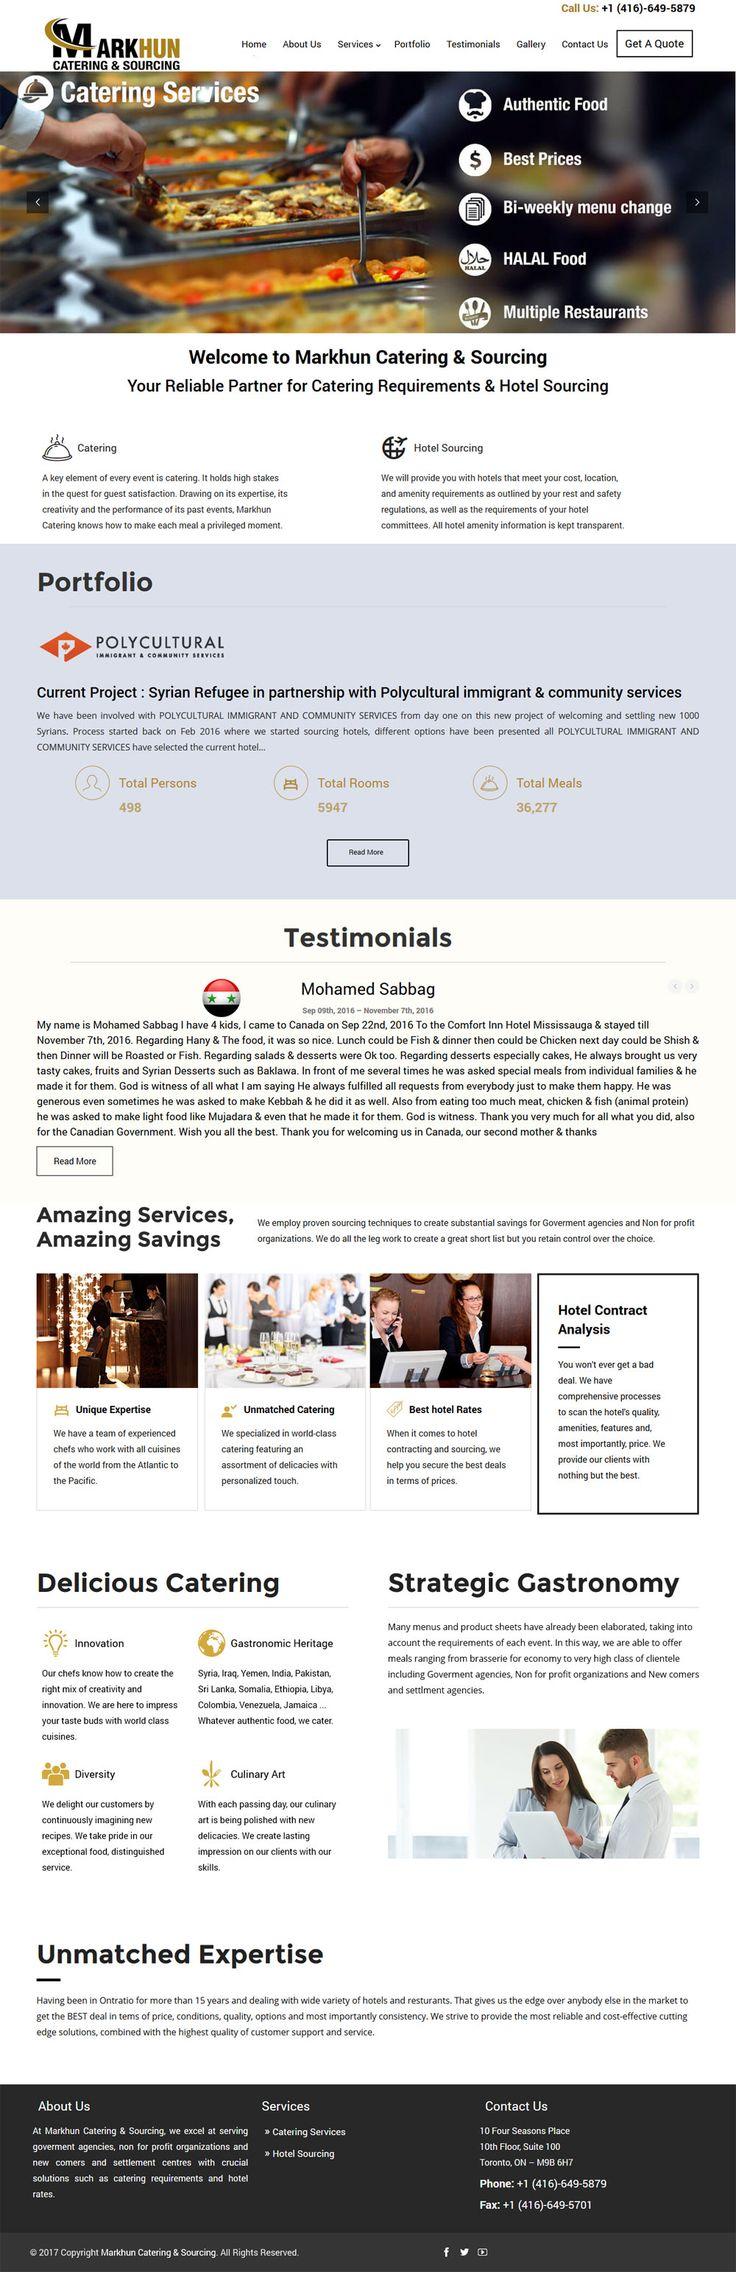 Checkout #latest #WordPress #websitedesign #portfolio #MarkhunCatering #mississauga #ontario #canada